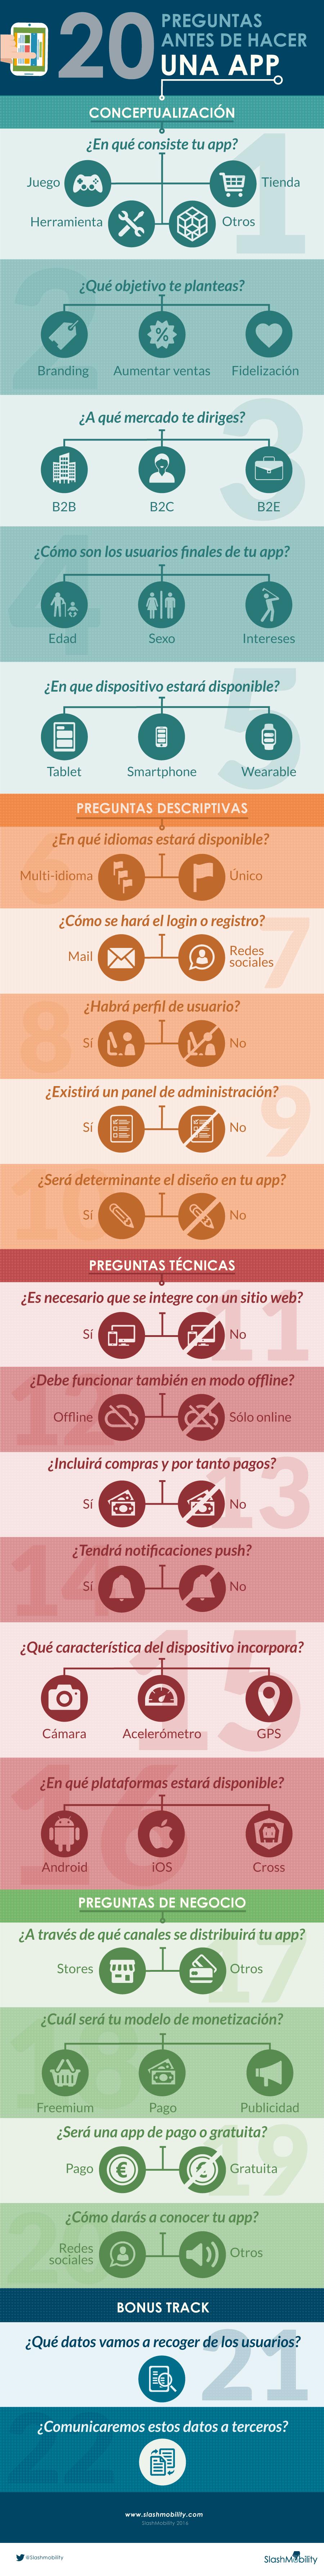 febrero_02-infografia (1)